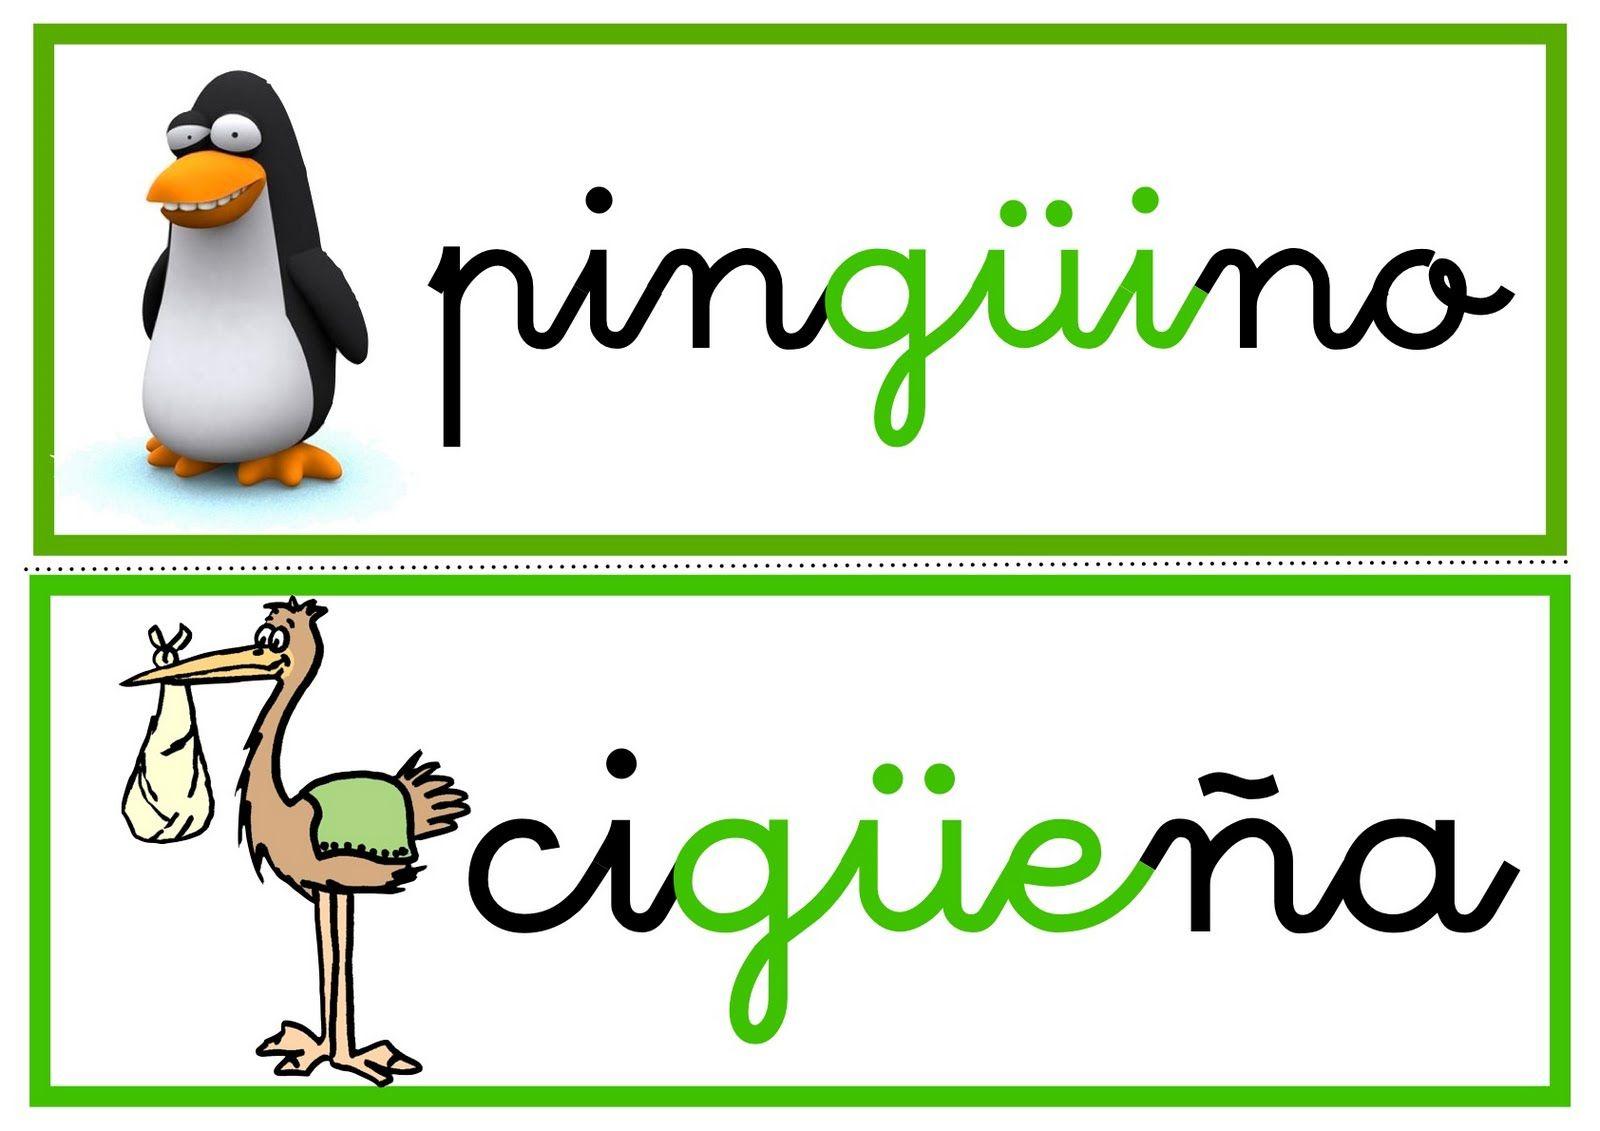 ortografia palabras con gue gui g e y g i 1st grade classroom ideas pinterest spanish. Black Bedroom Furniture Sets. Home Design Ideas